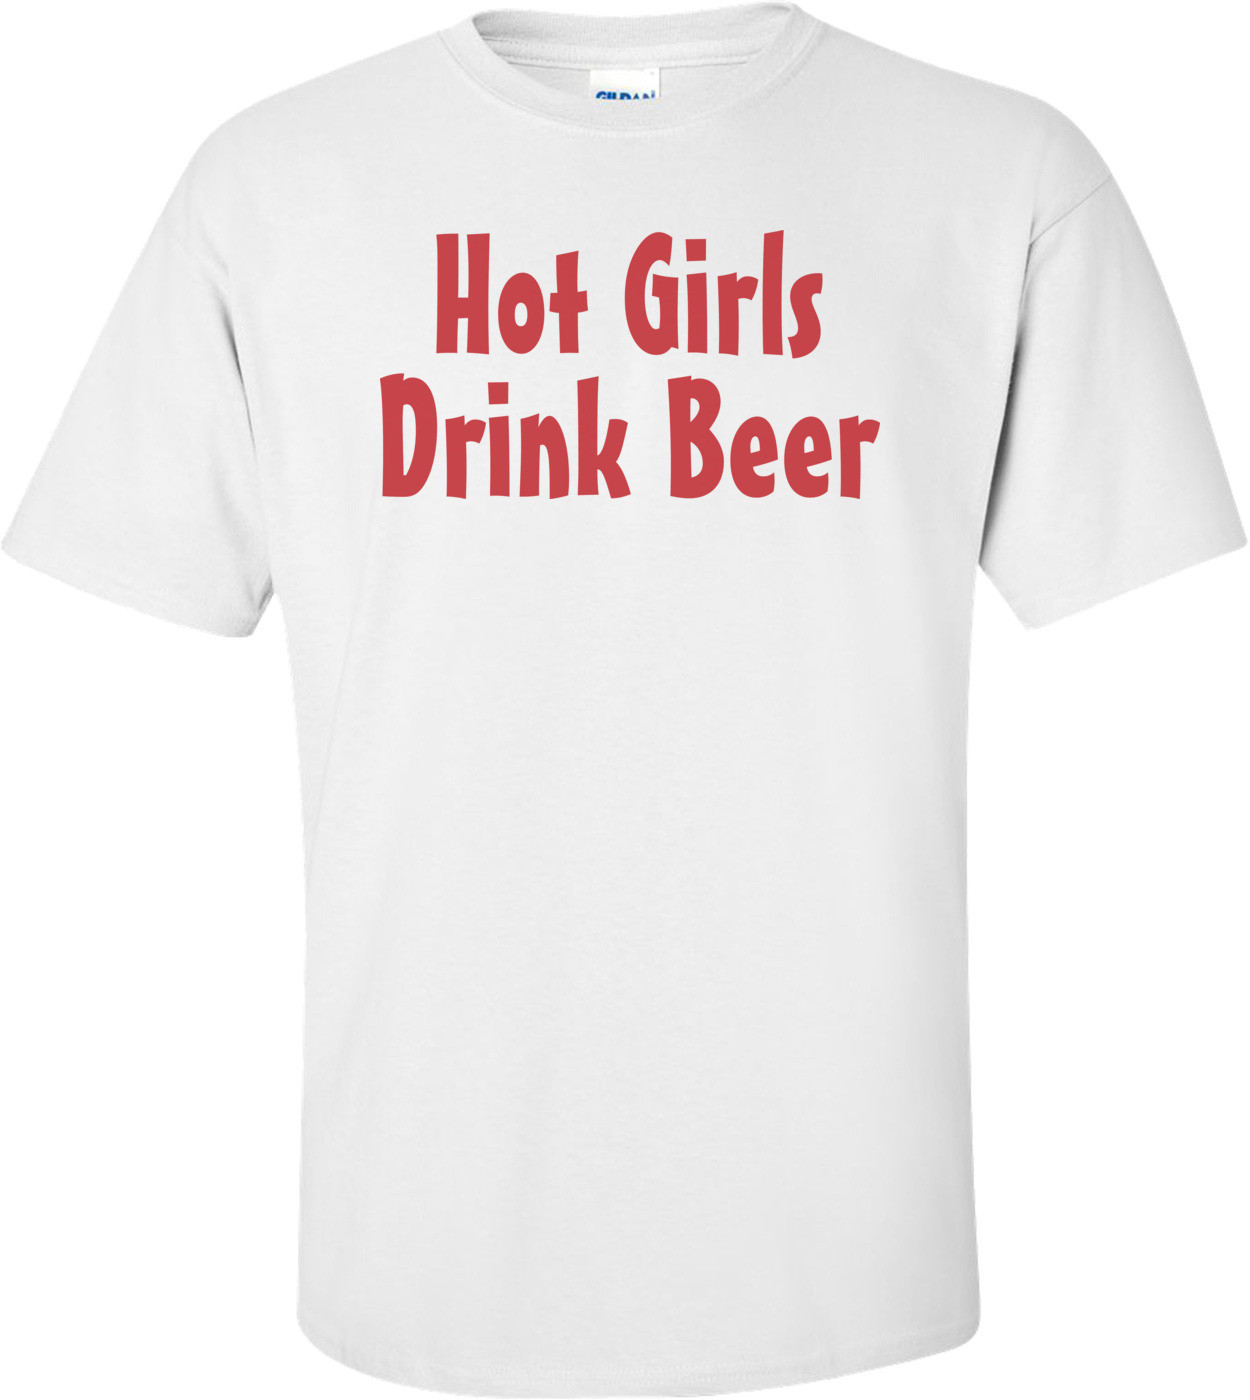 Hot Girls Drink Beer T-shirt